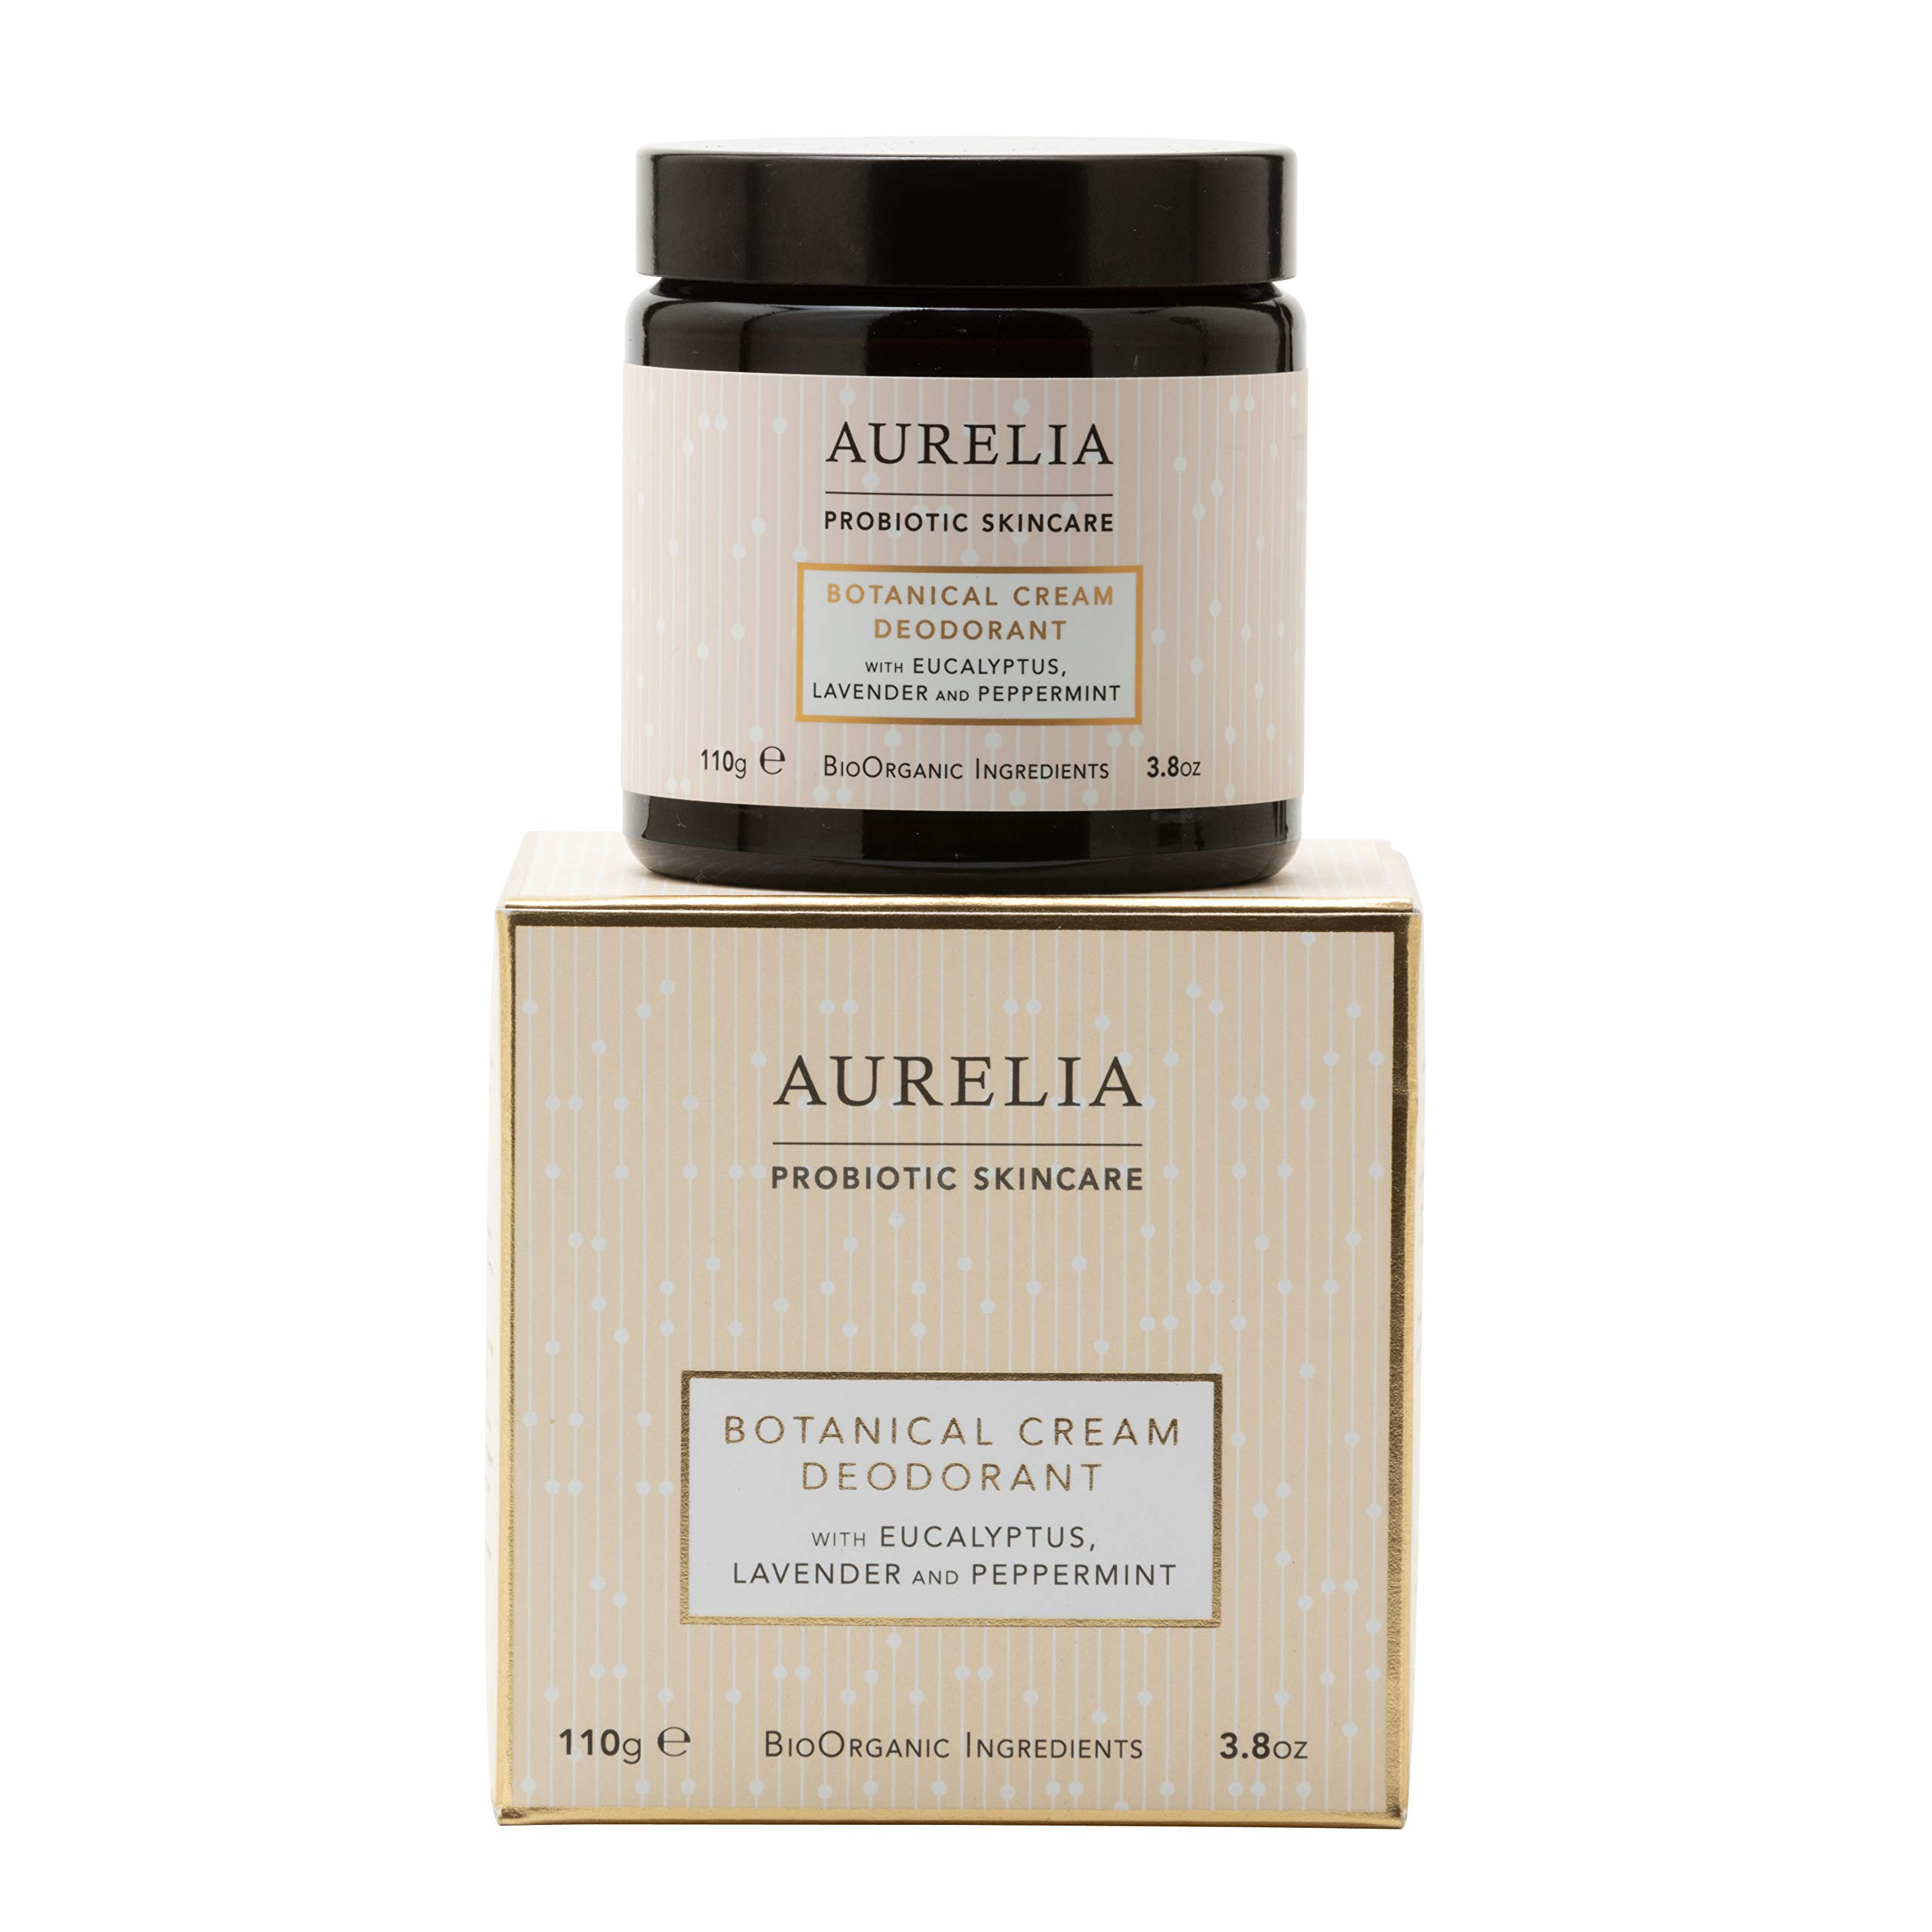 Aurelia Botanical Cream Deodorant, 110 g by Aurelia